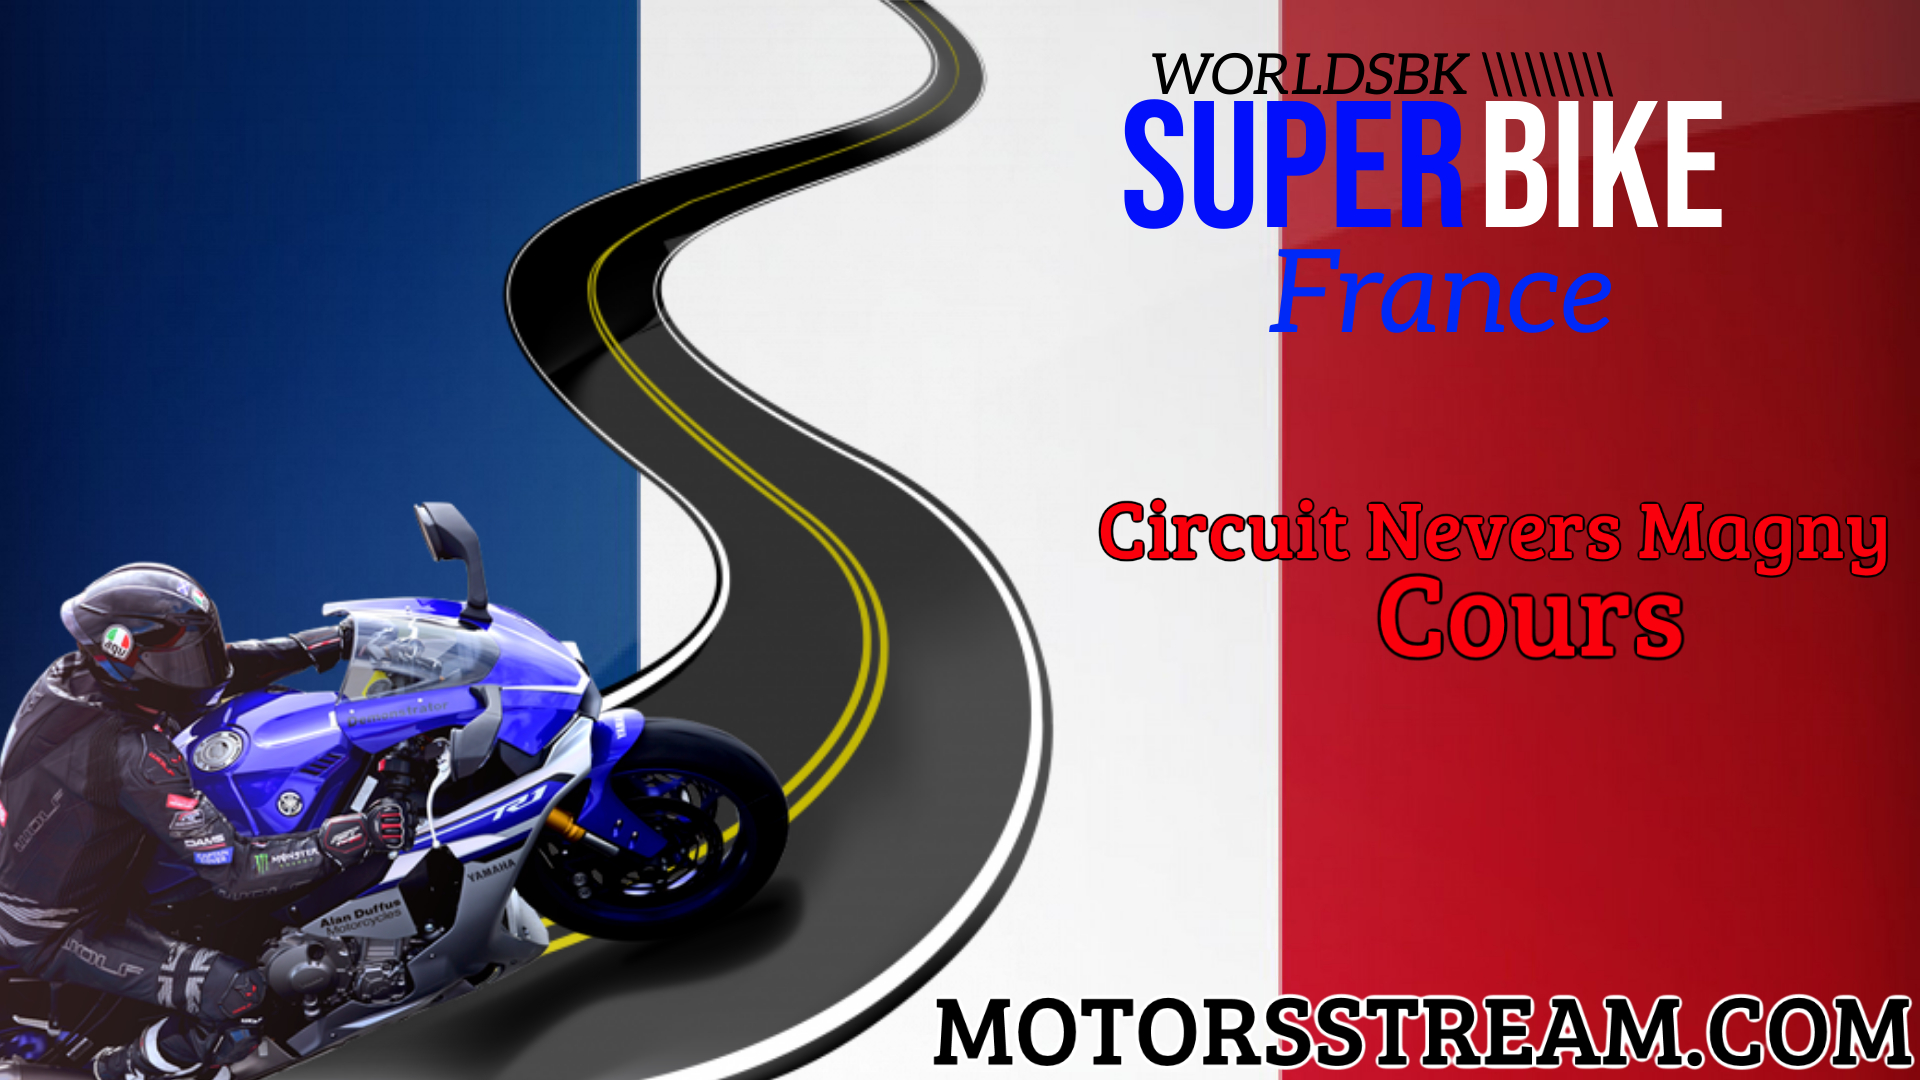 France WSBK Round 6 Live Stream 2021